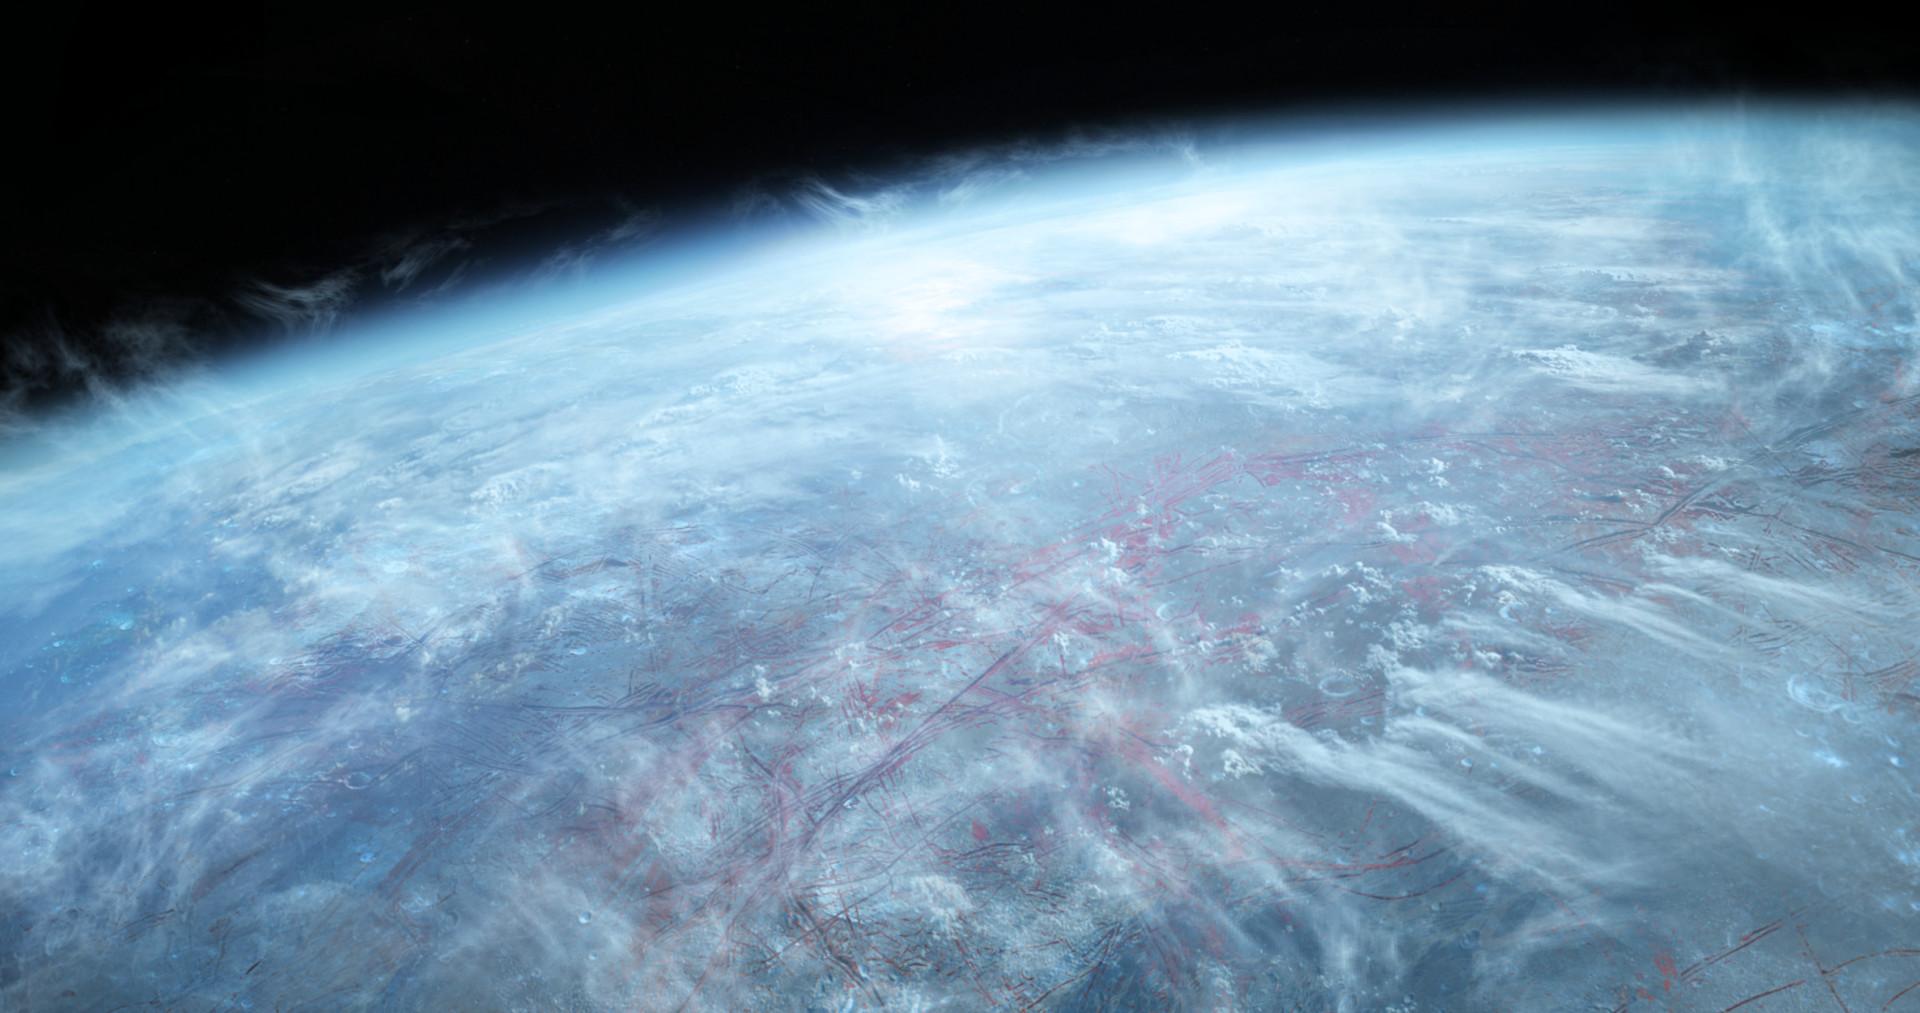 Ryan groskamp europa planet 0 00 02 12